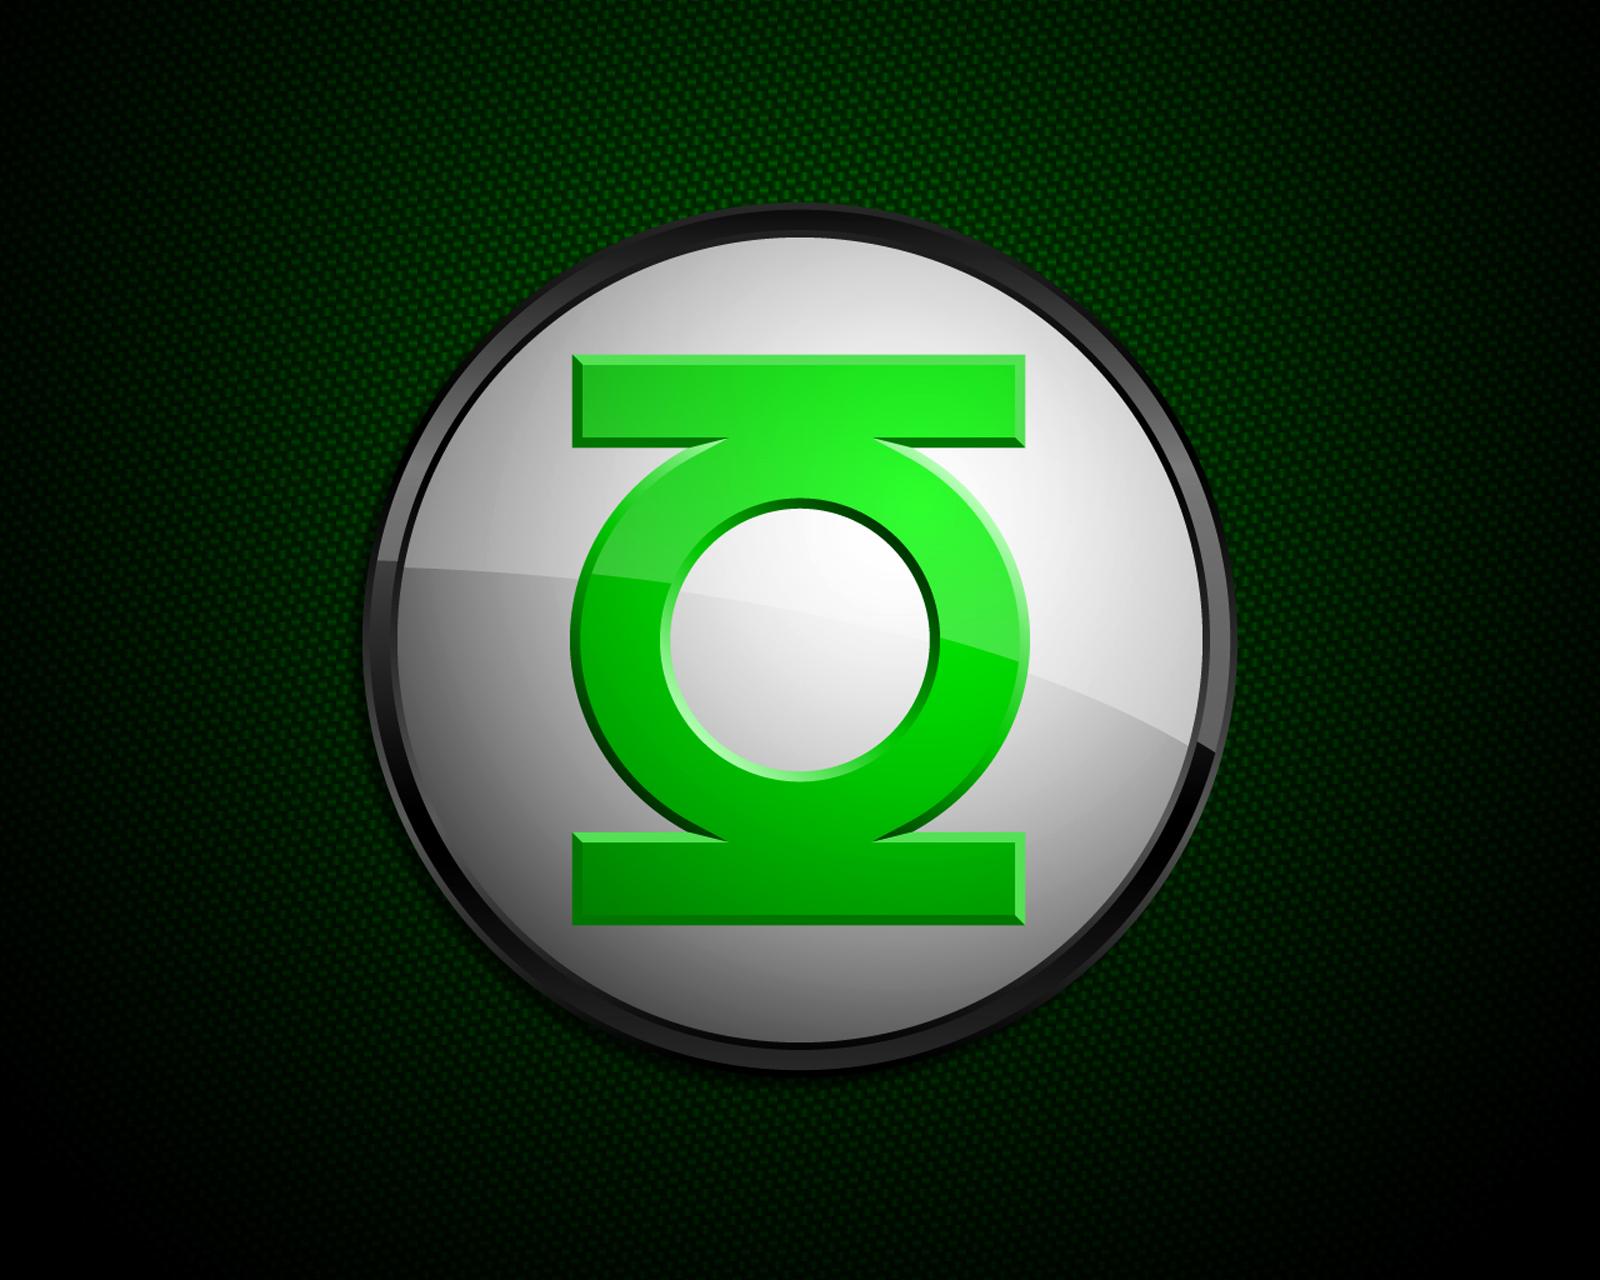 Green Lantern Comics Logo Minimal HD Wallpapers HQ ...